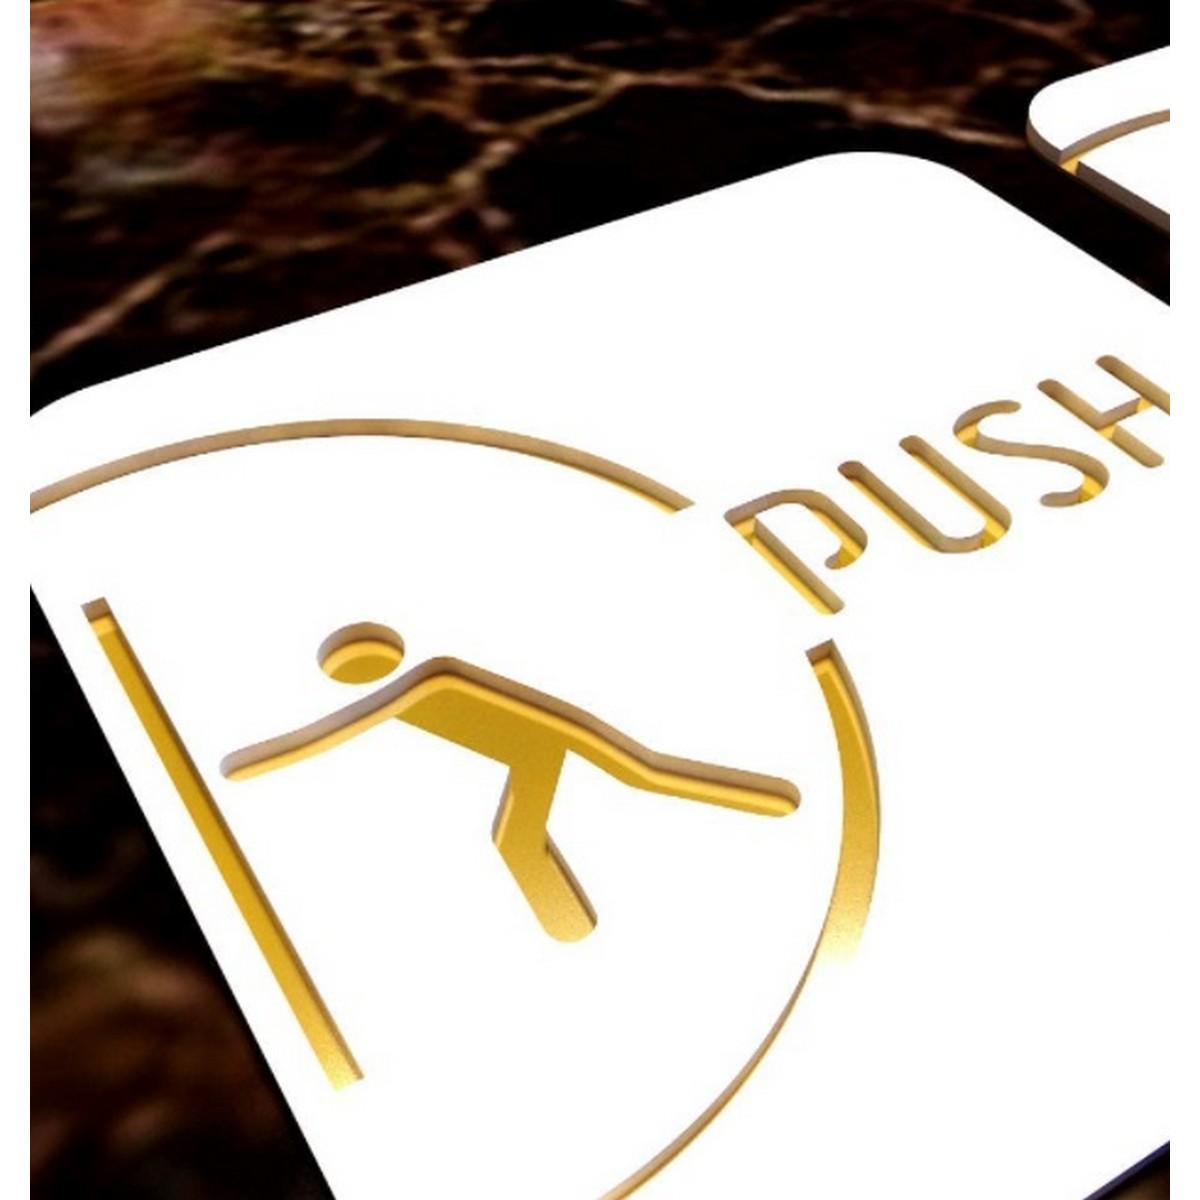 PushPull Acrylic Door Signages  PushPull Acrylic Door Signages 2